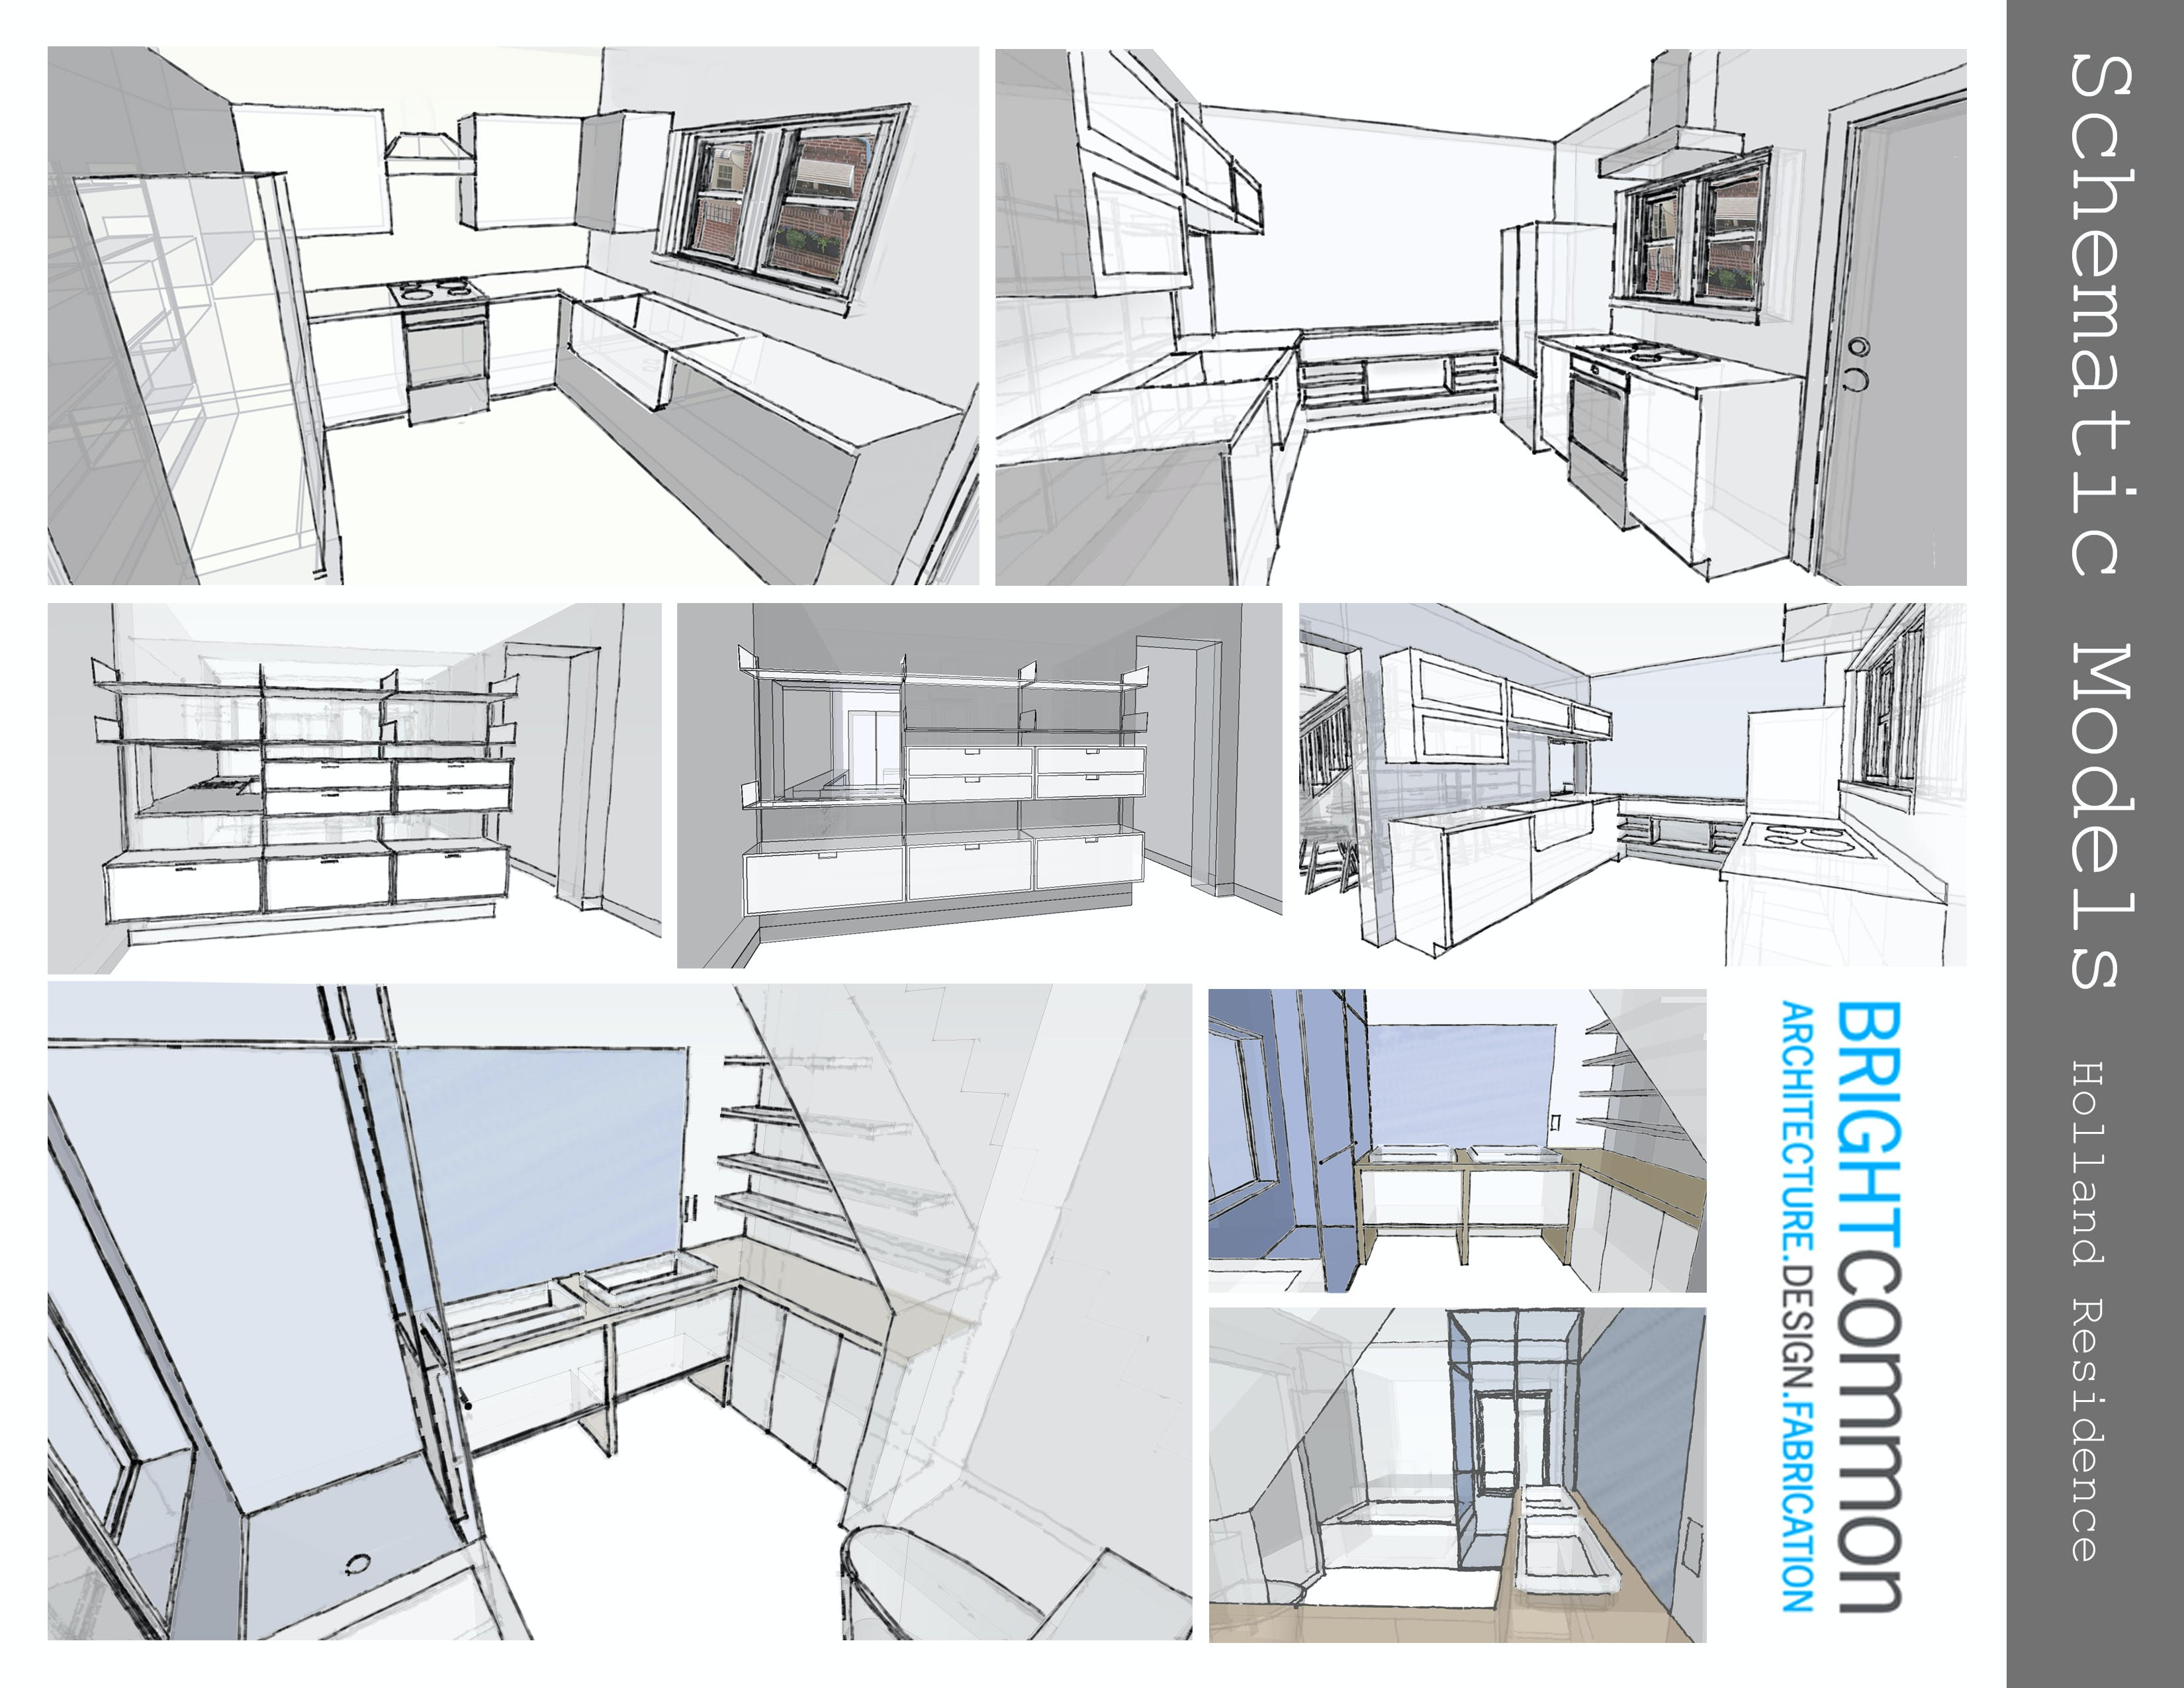 Schematic Design Model | Elizabeth Wotring | Archinect